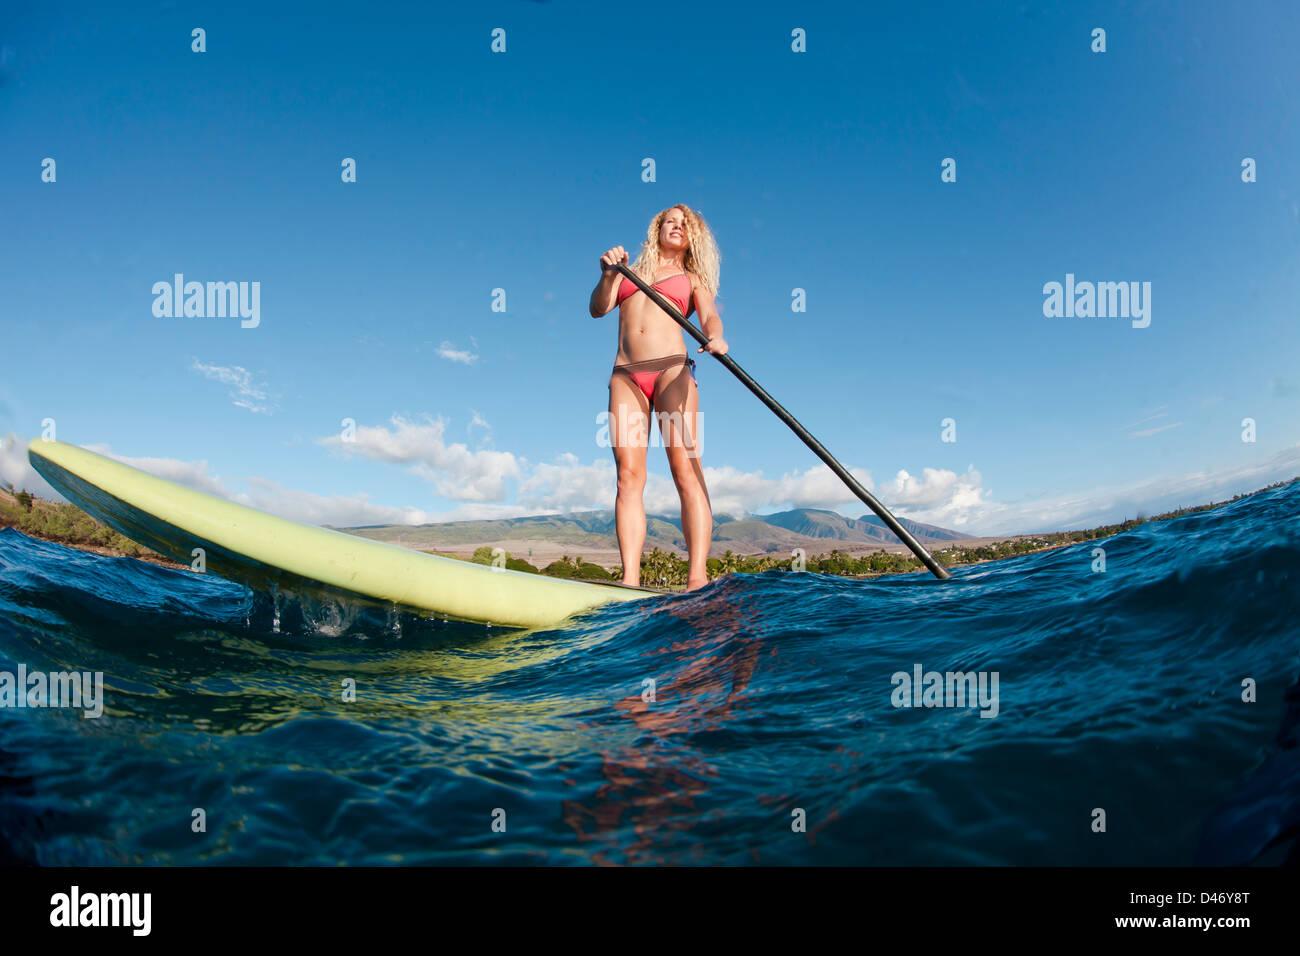 Instructeur de Surf Angioletti Tara sur un stand-up paddle board off Canoe Bearch, Maui. Hawaii. Photo Stock